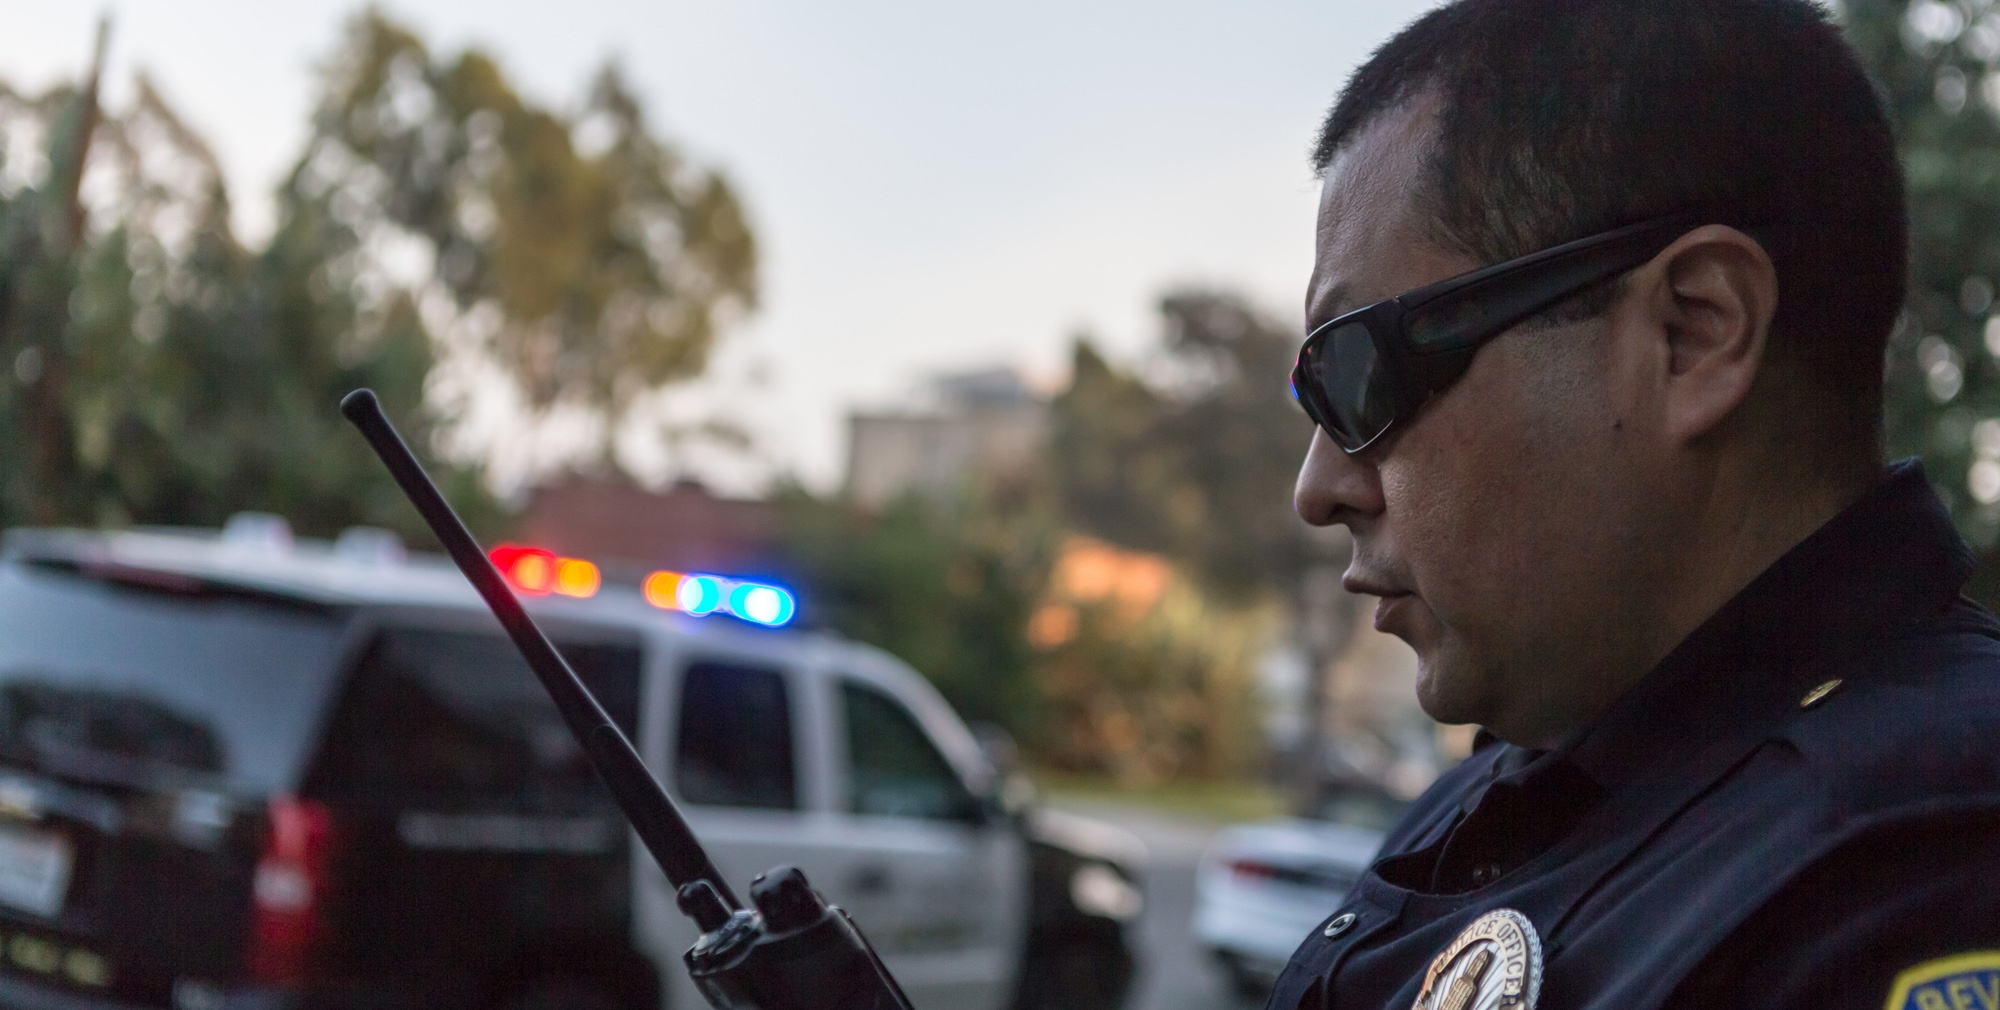 Police_Officer_Starcom21